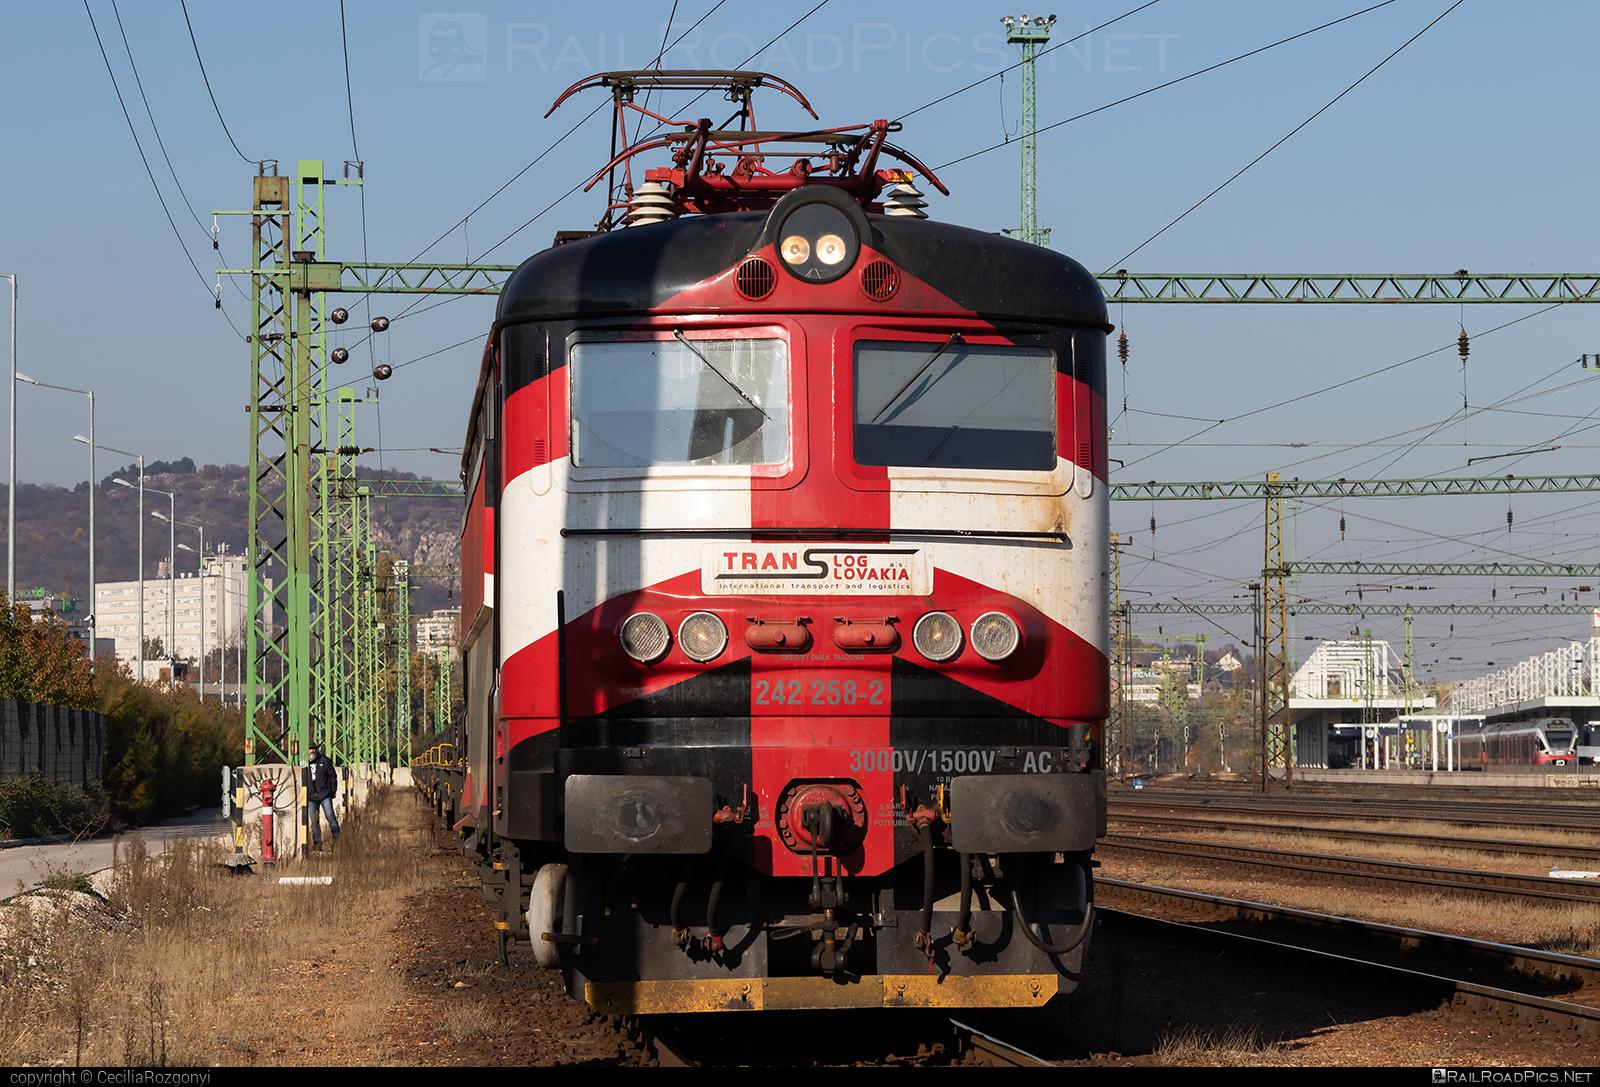 Škoda 73E - 242 258-2 operated by PETROLSPED Slovakia s.r.o. #locomotive242 #plechac #skoda #skoda73e #tlssk #translog #translogslovakia